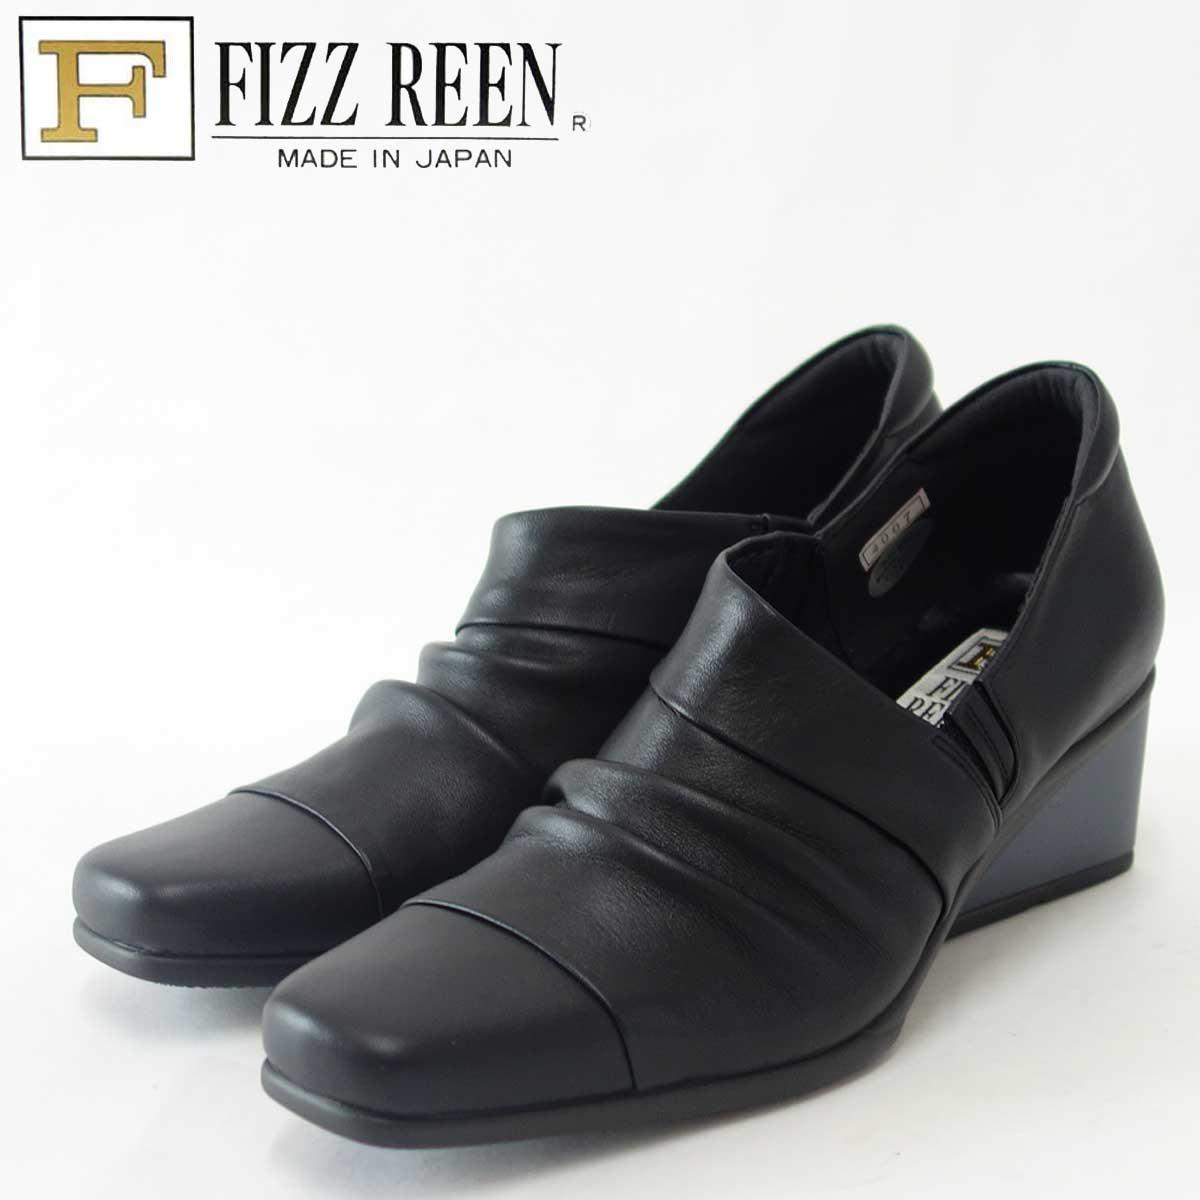 FIZZ REEN フィズリーン 4007 ブラックお洒落で疲れにくいウェッジシューズソフトな天然皮革で優しくフィット「靴」